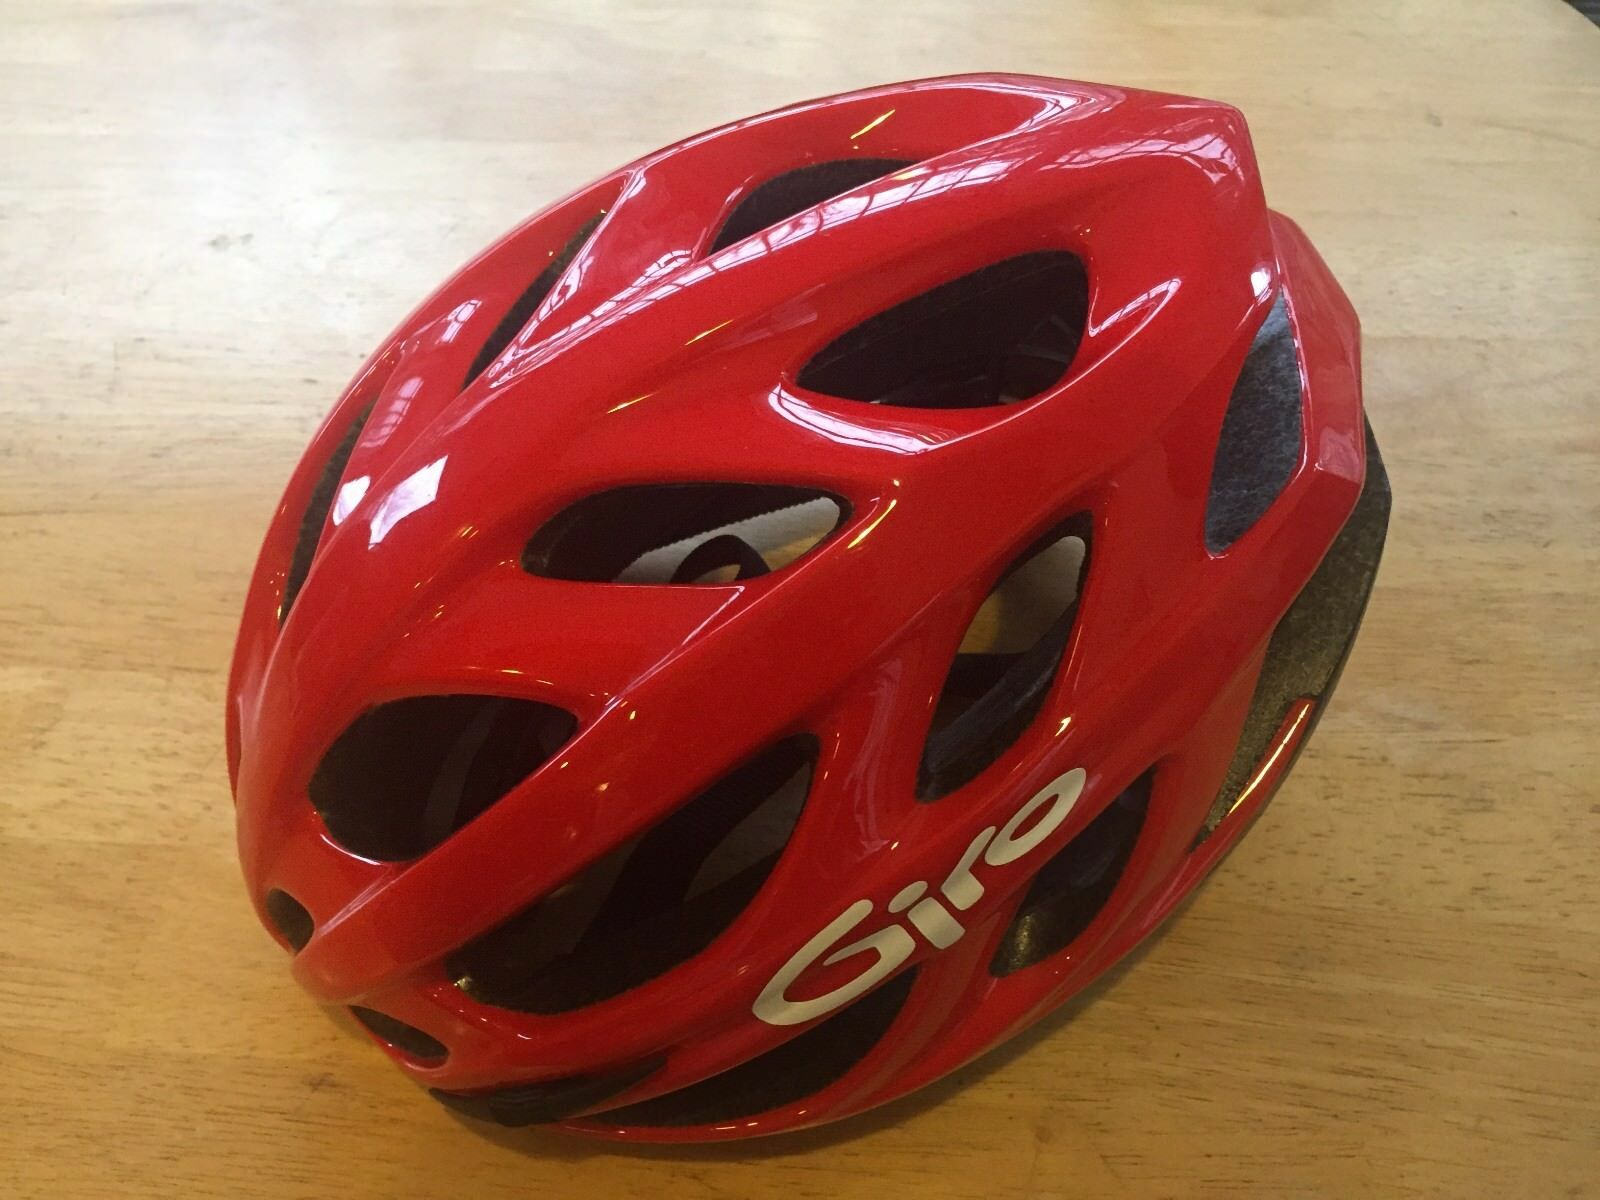 Giro E2 Cycling  Helmet S M  Red White  world famous sale online